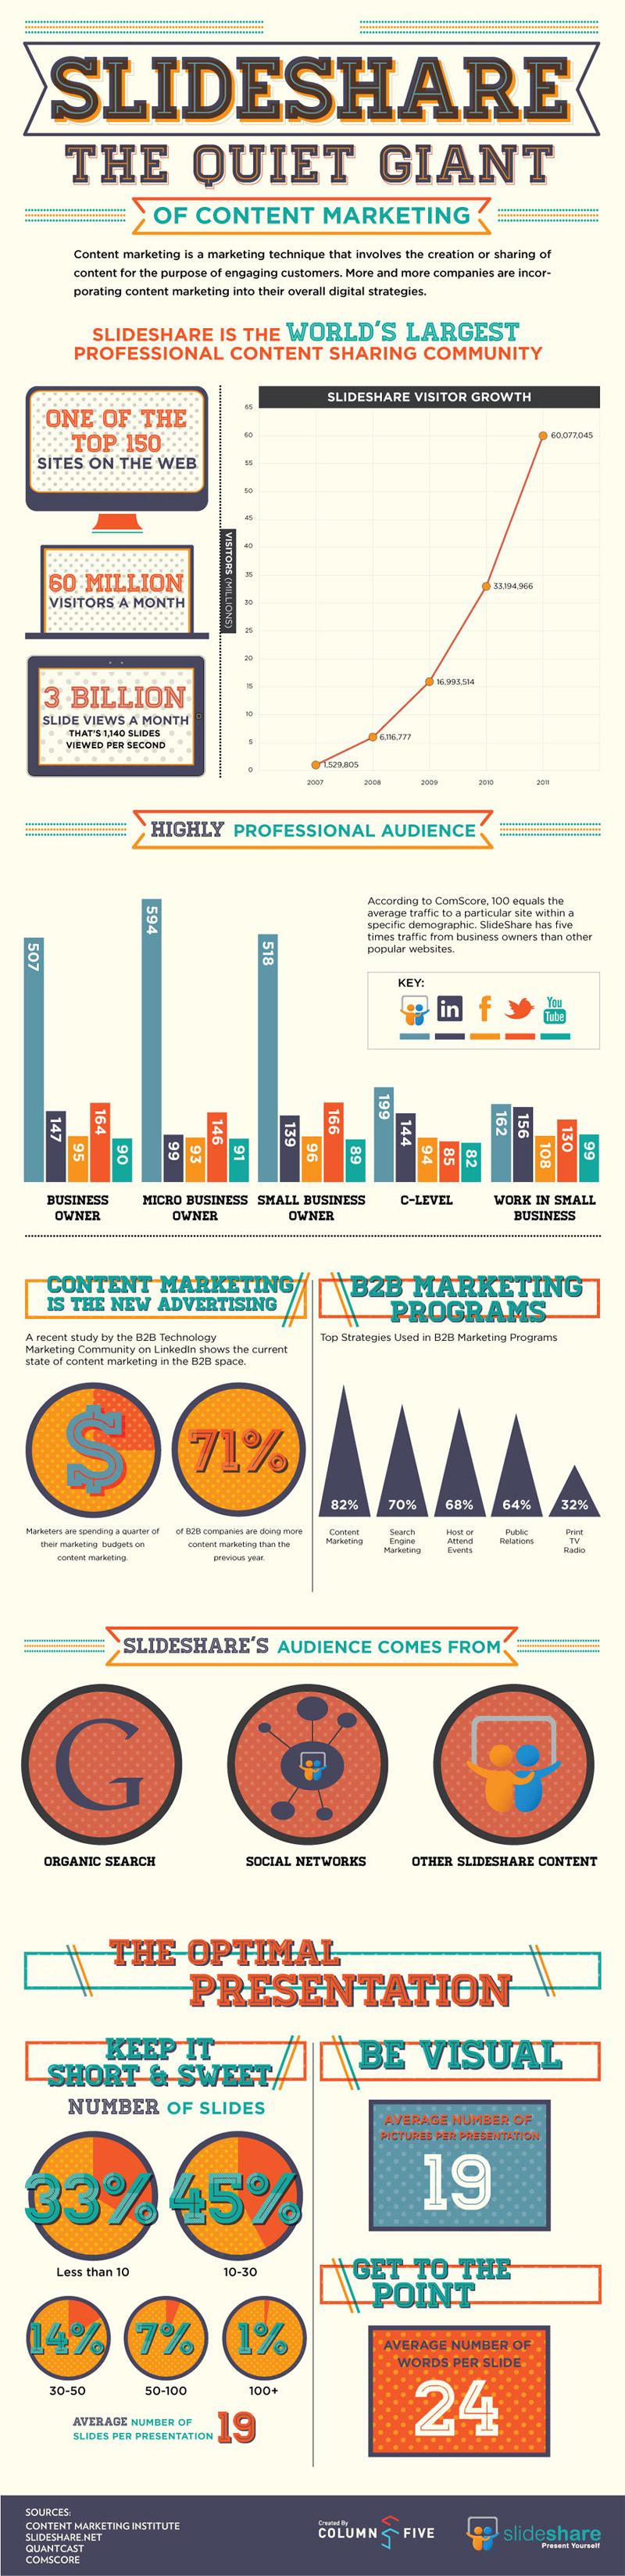 Slideshare-Statistics-Infographic